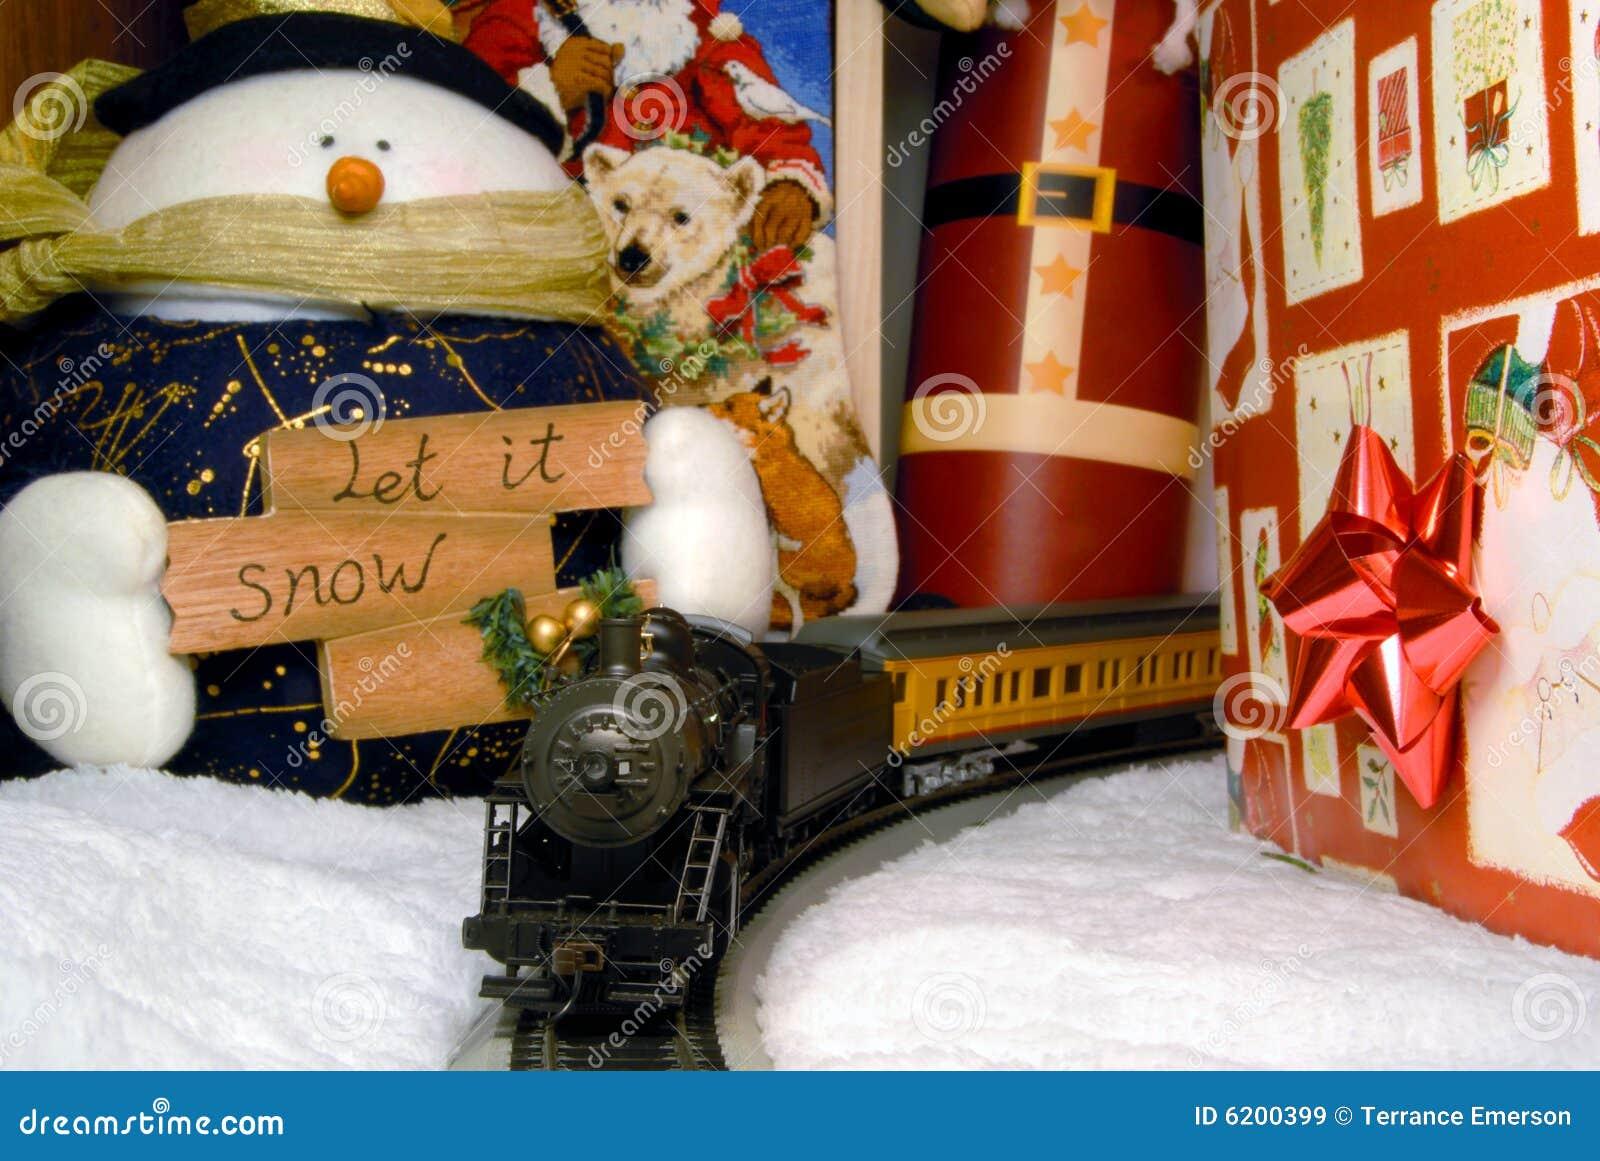 #BF360C Electric Train And Christmas Decoration Royalty Free Stock  6083 decoration de noel train electrique 1300x960 px @ aertt.com